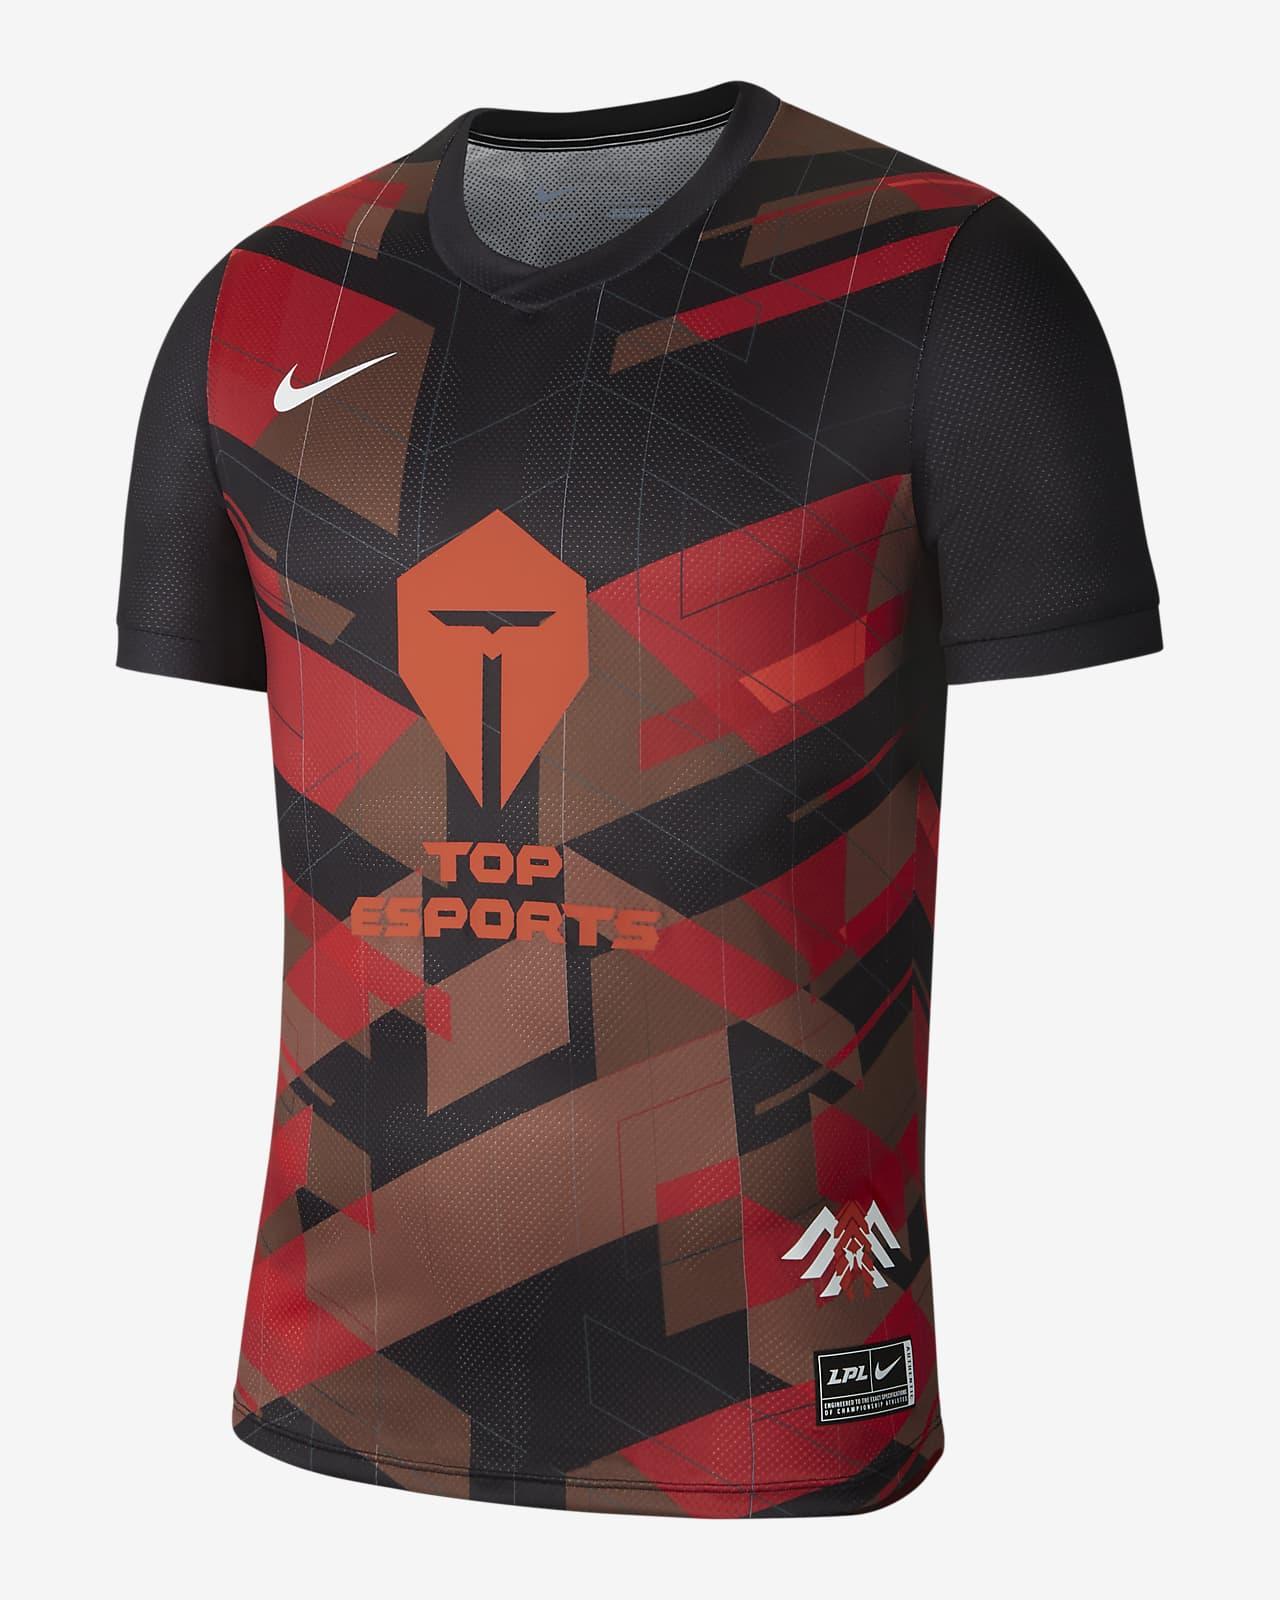 Nike x LPL TES 男子比赛服